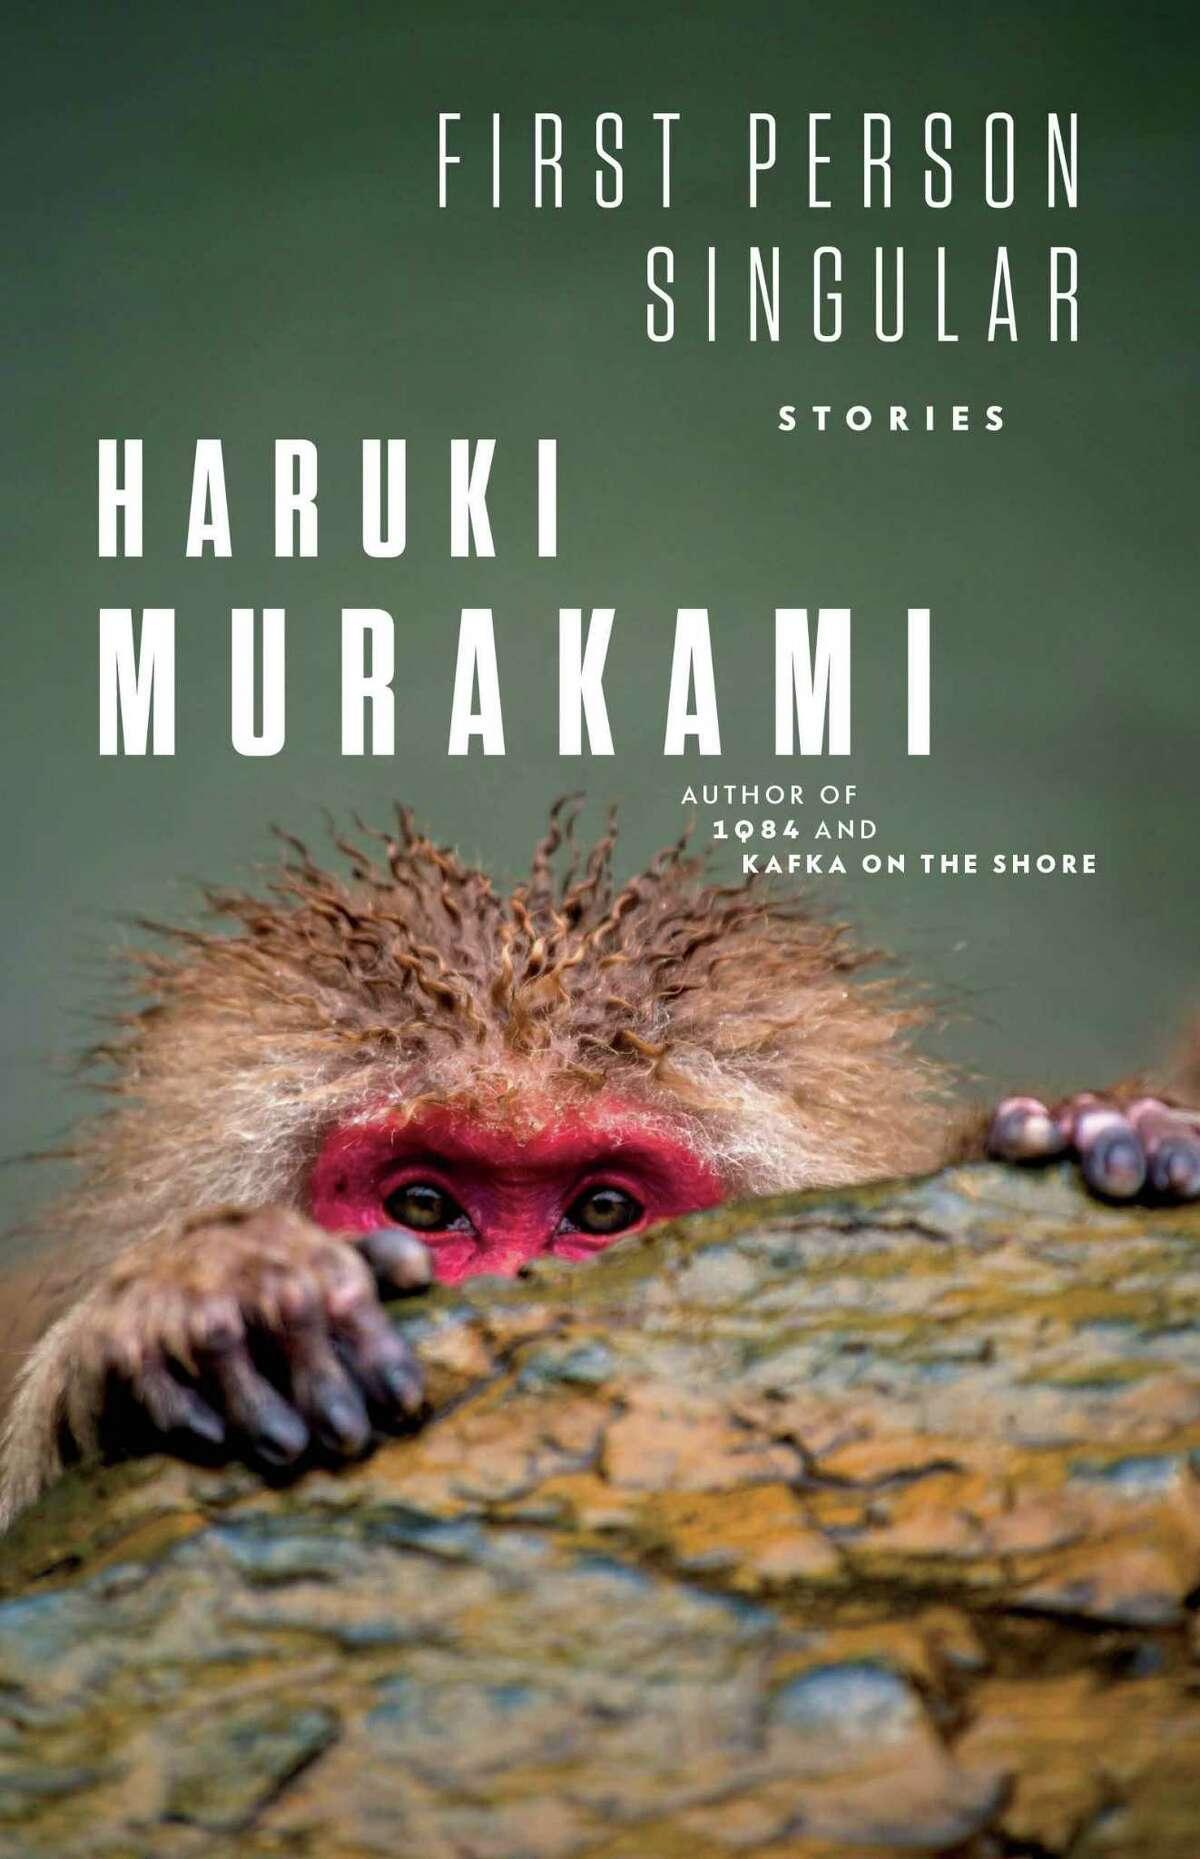 """First Person Singular"" by Haruki Murakami"